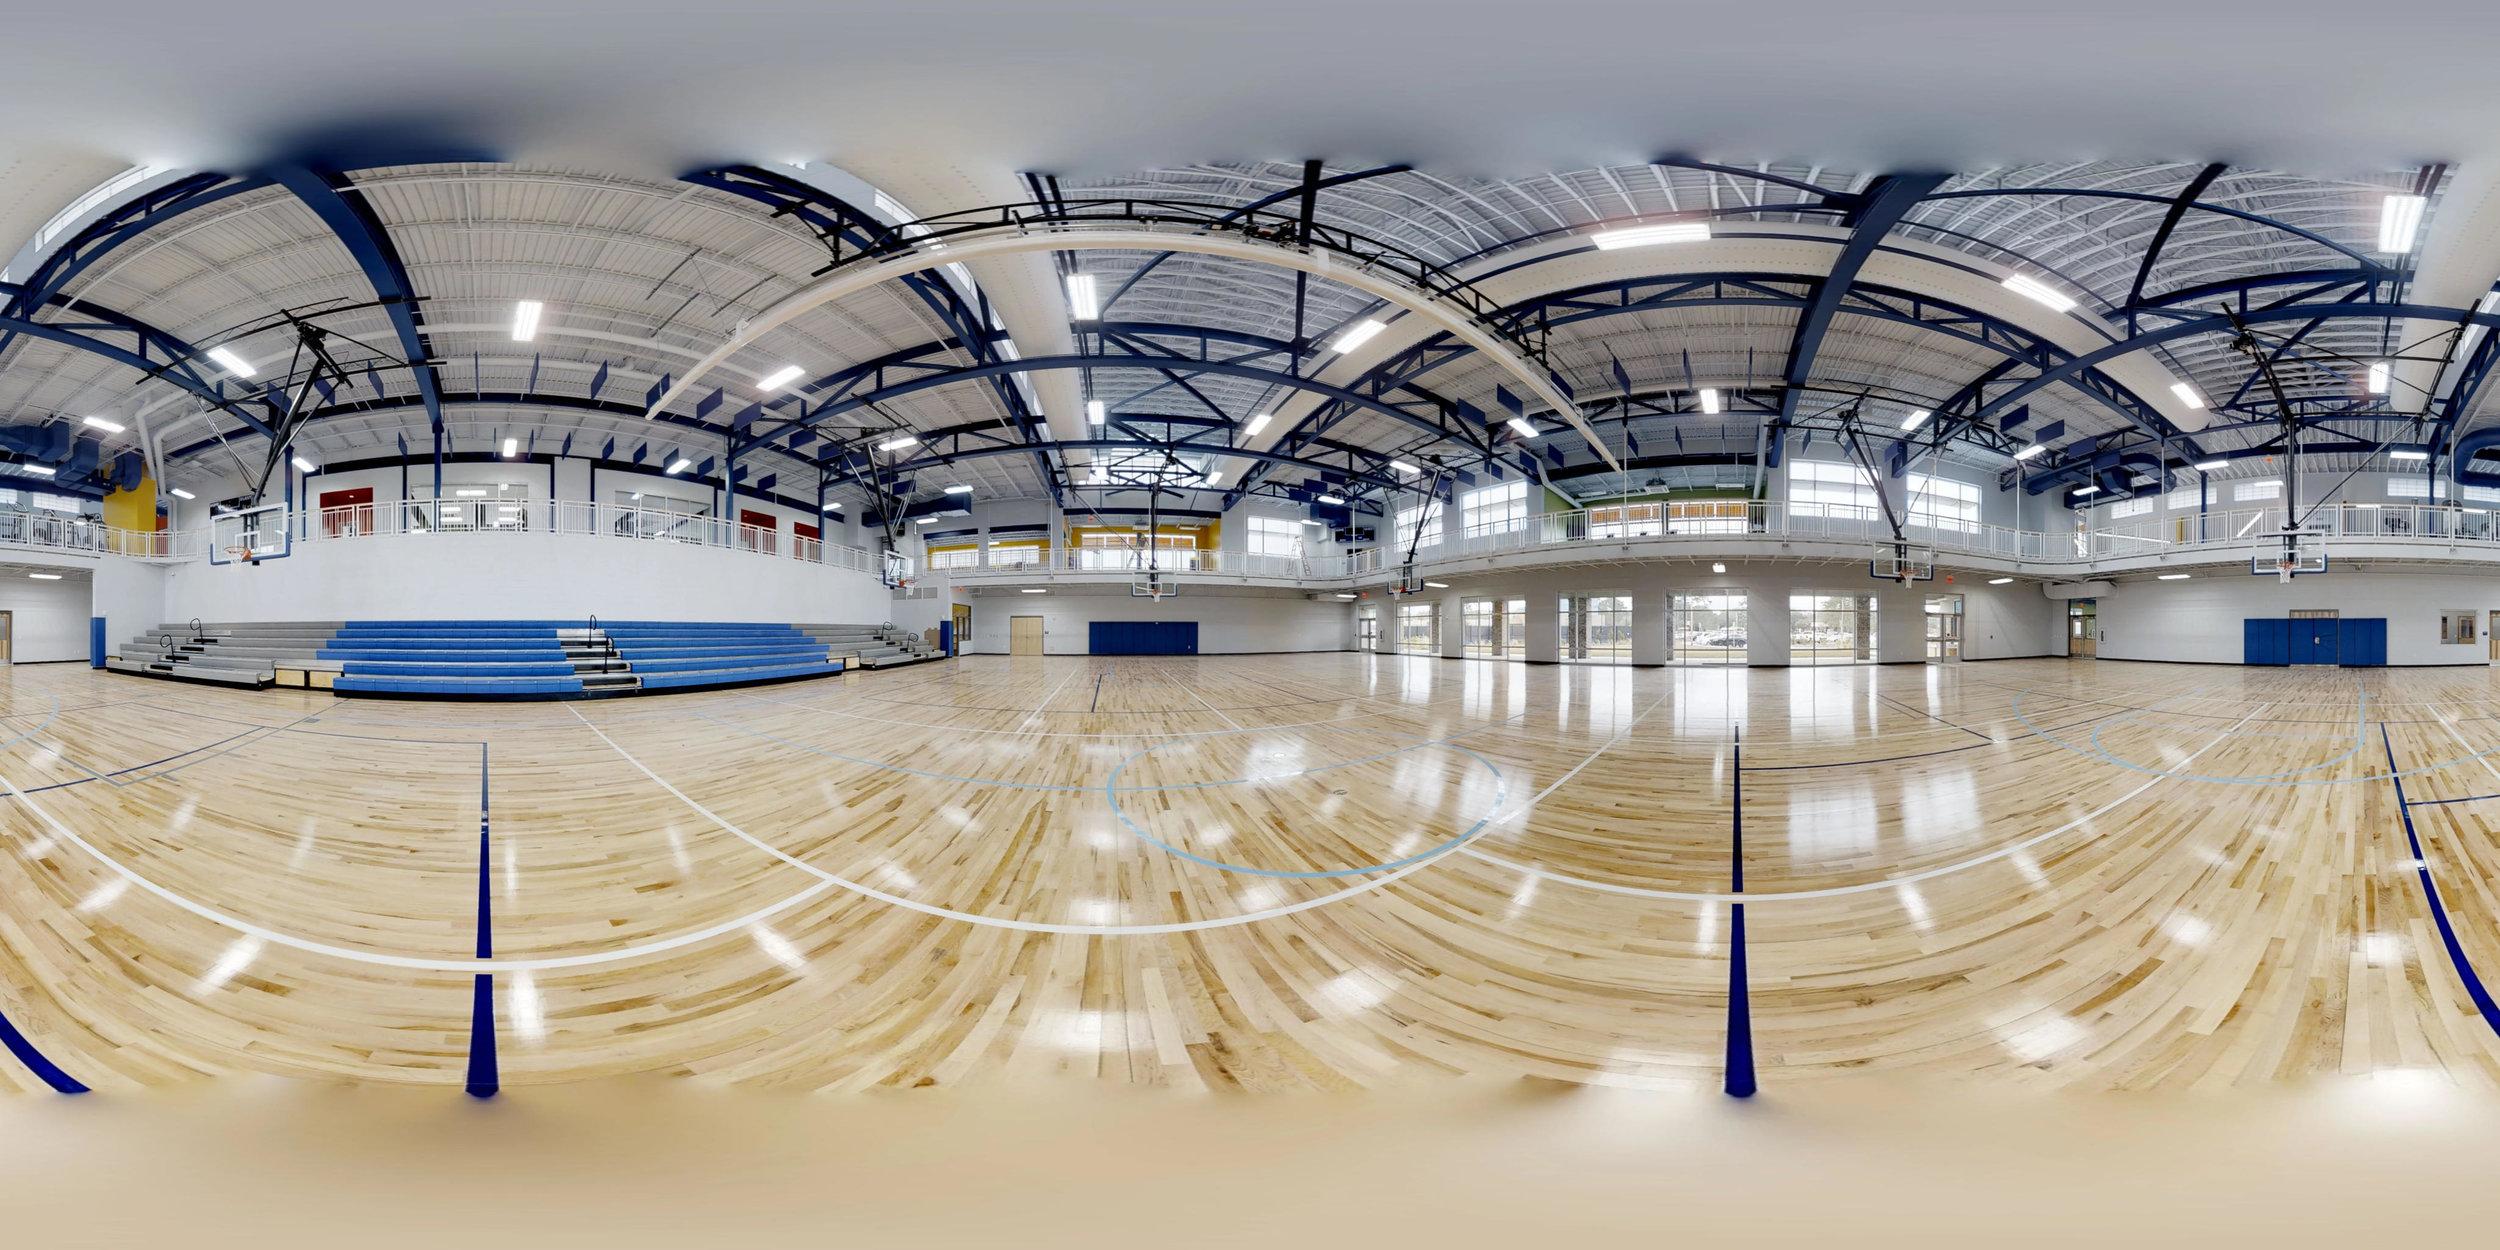 Gym and/or Pool - Palmetto Electric Gym, Rotary Club Gym, or Island Rec Center Pool